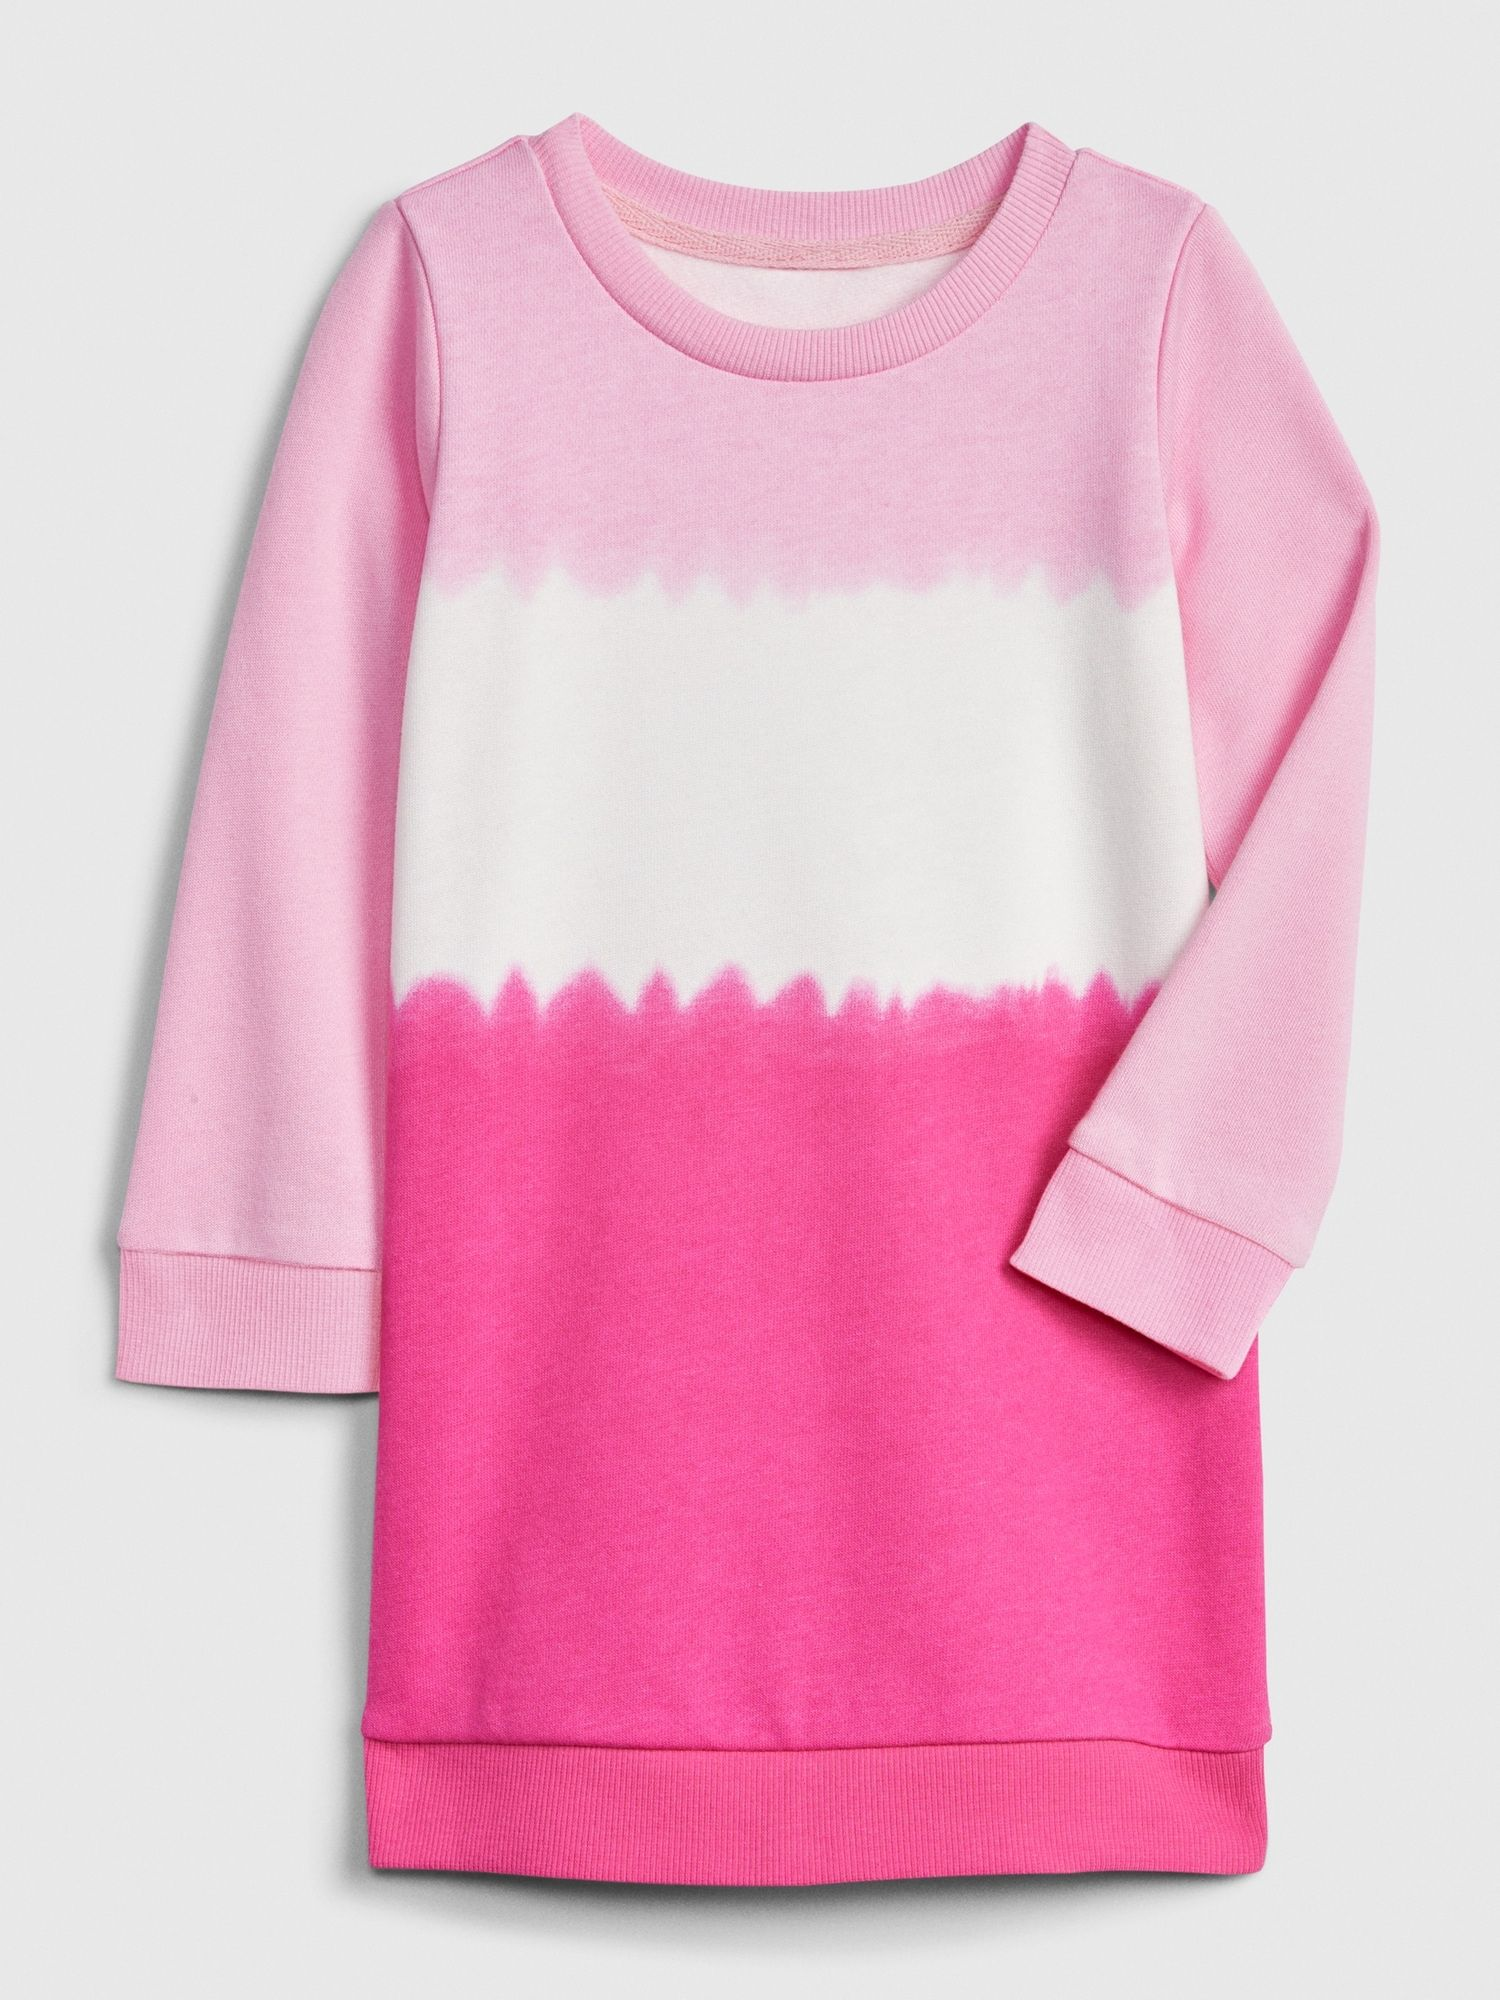 Gap Toddler Tie Dye Sweatshirt Dress Pure Pink Toddler Ties Girl Sweatshirts Tie Dye Sweatshirt [ 2000 x 1500 Pixel ]